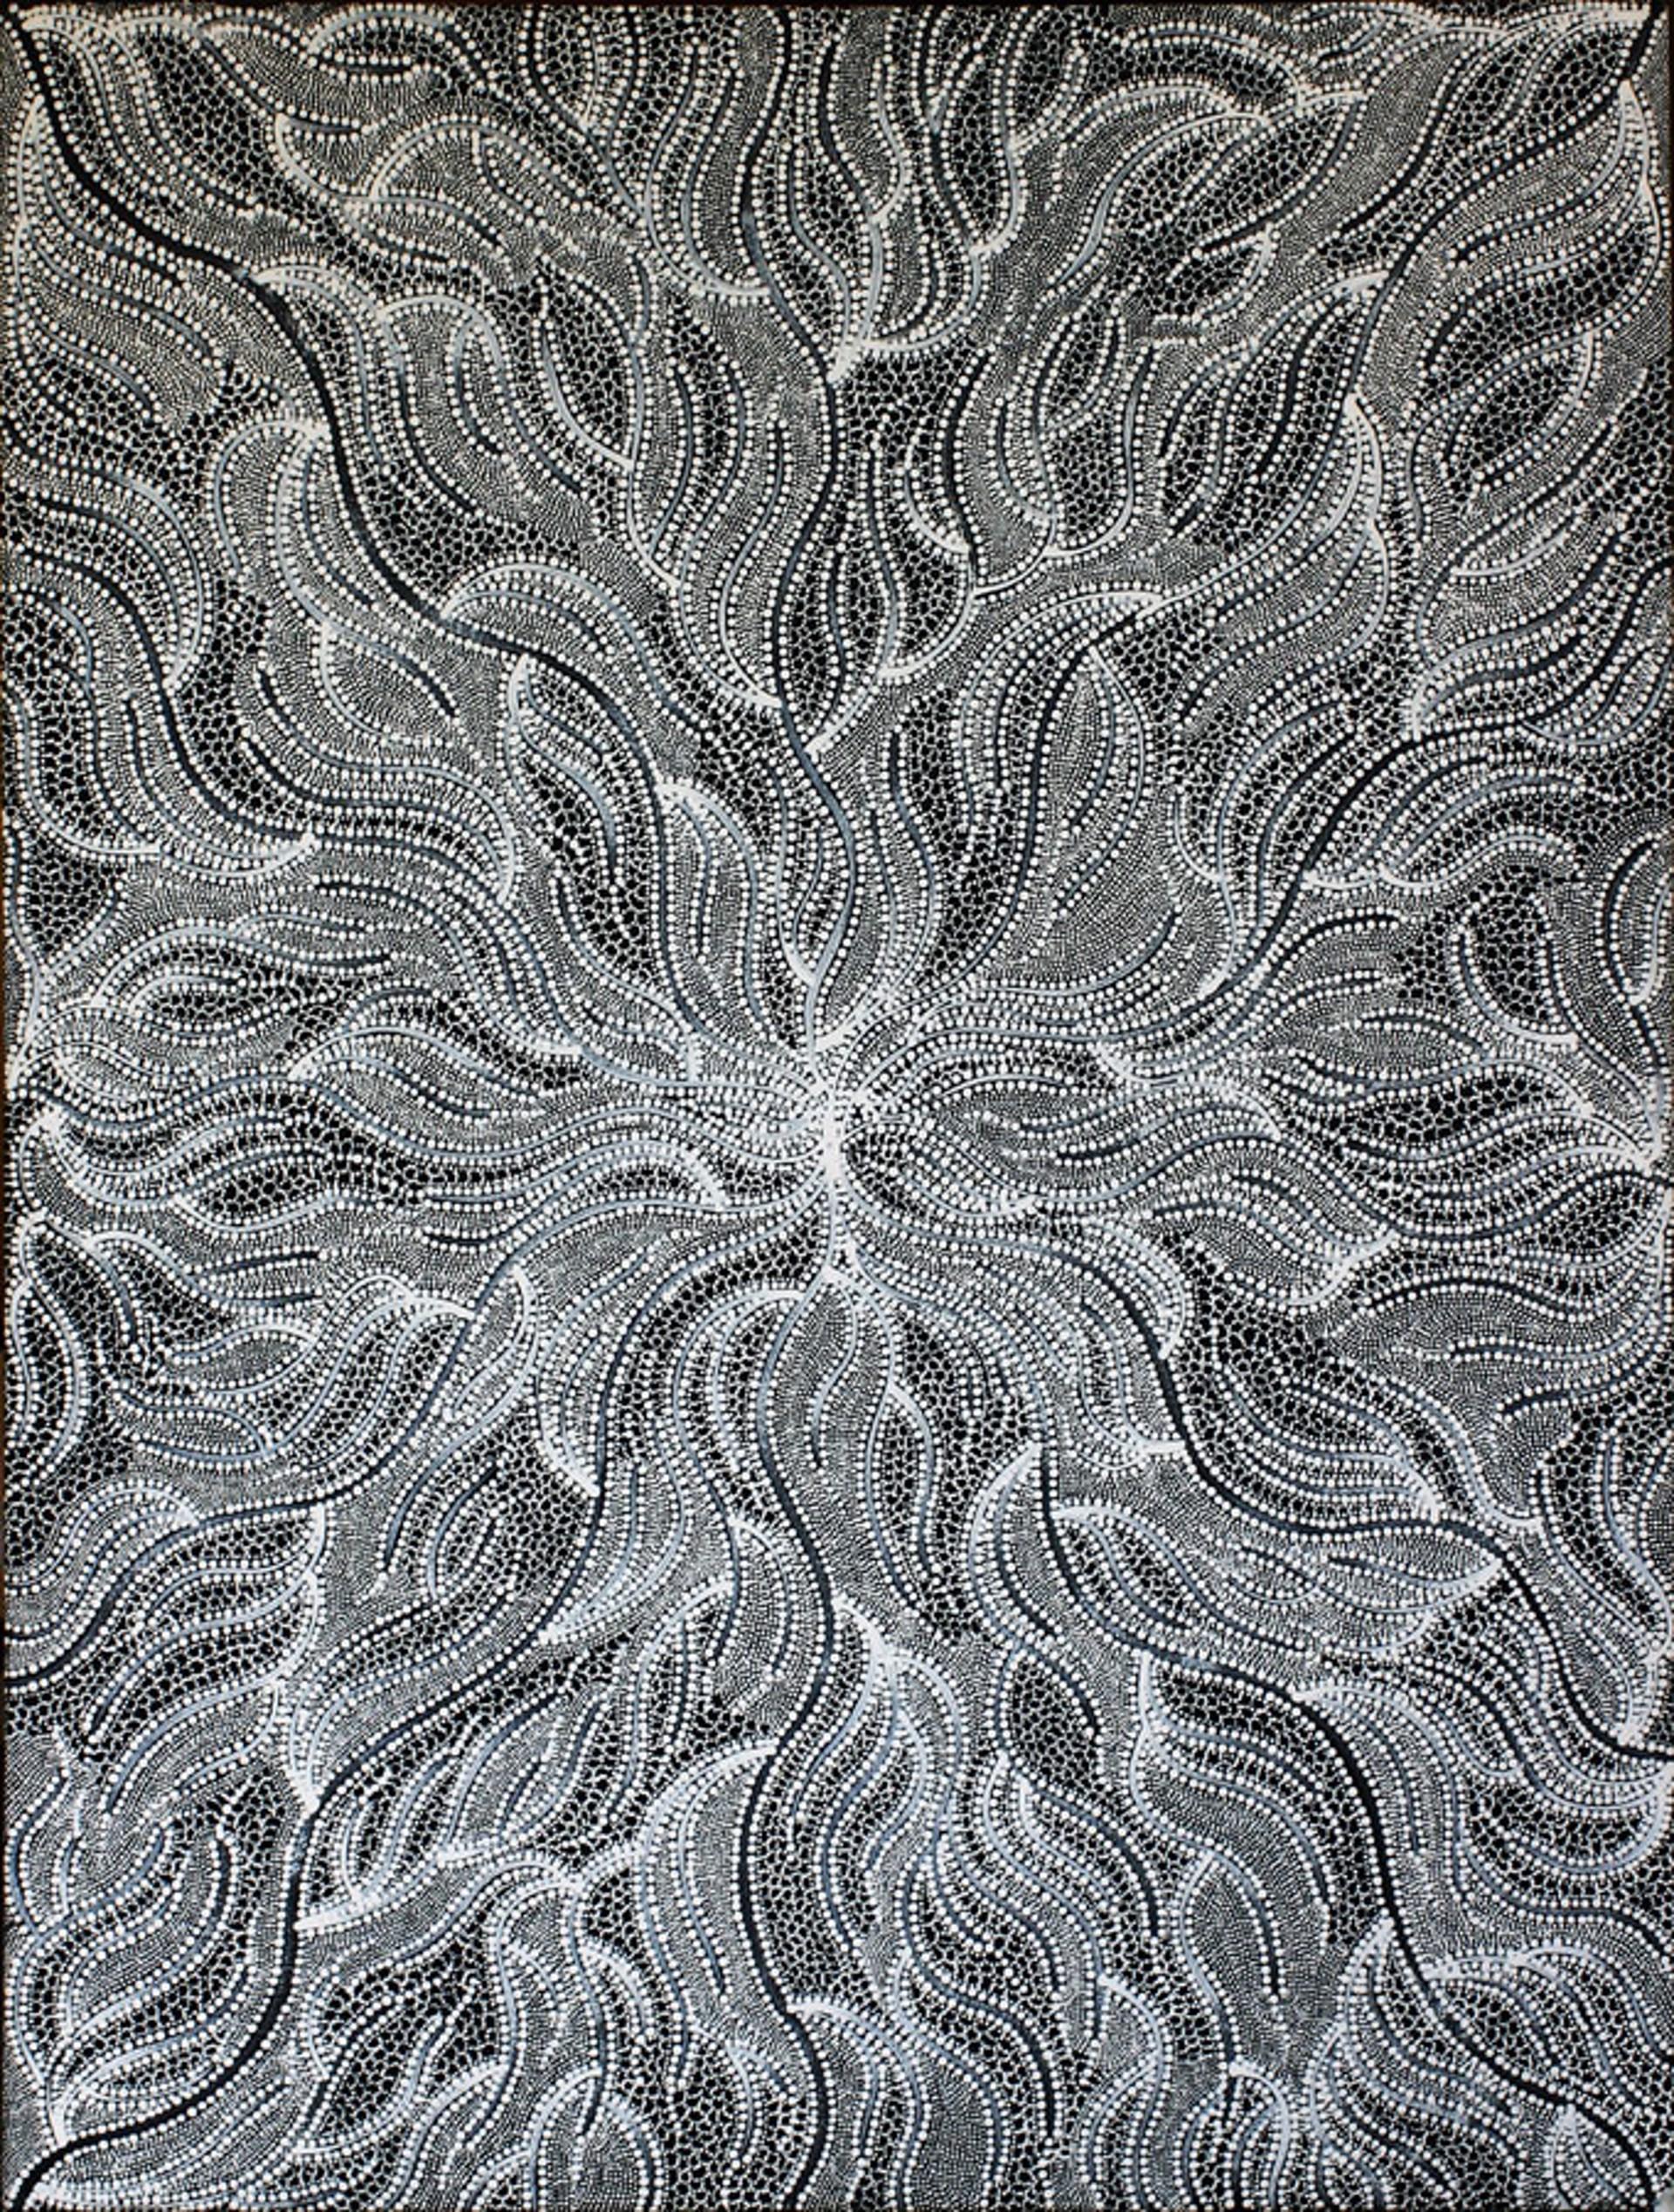 Ngapa (Water Dreaming) by Australian Aboriginal Artists